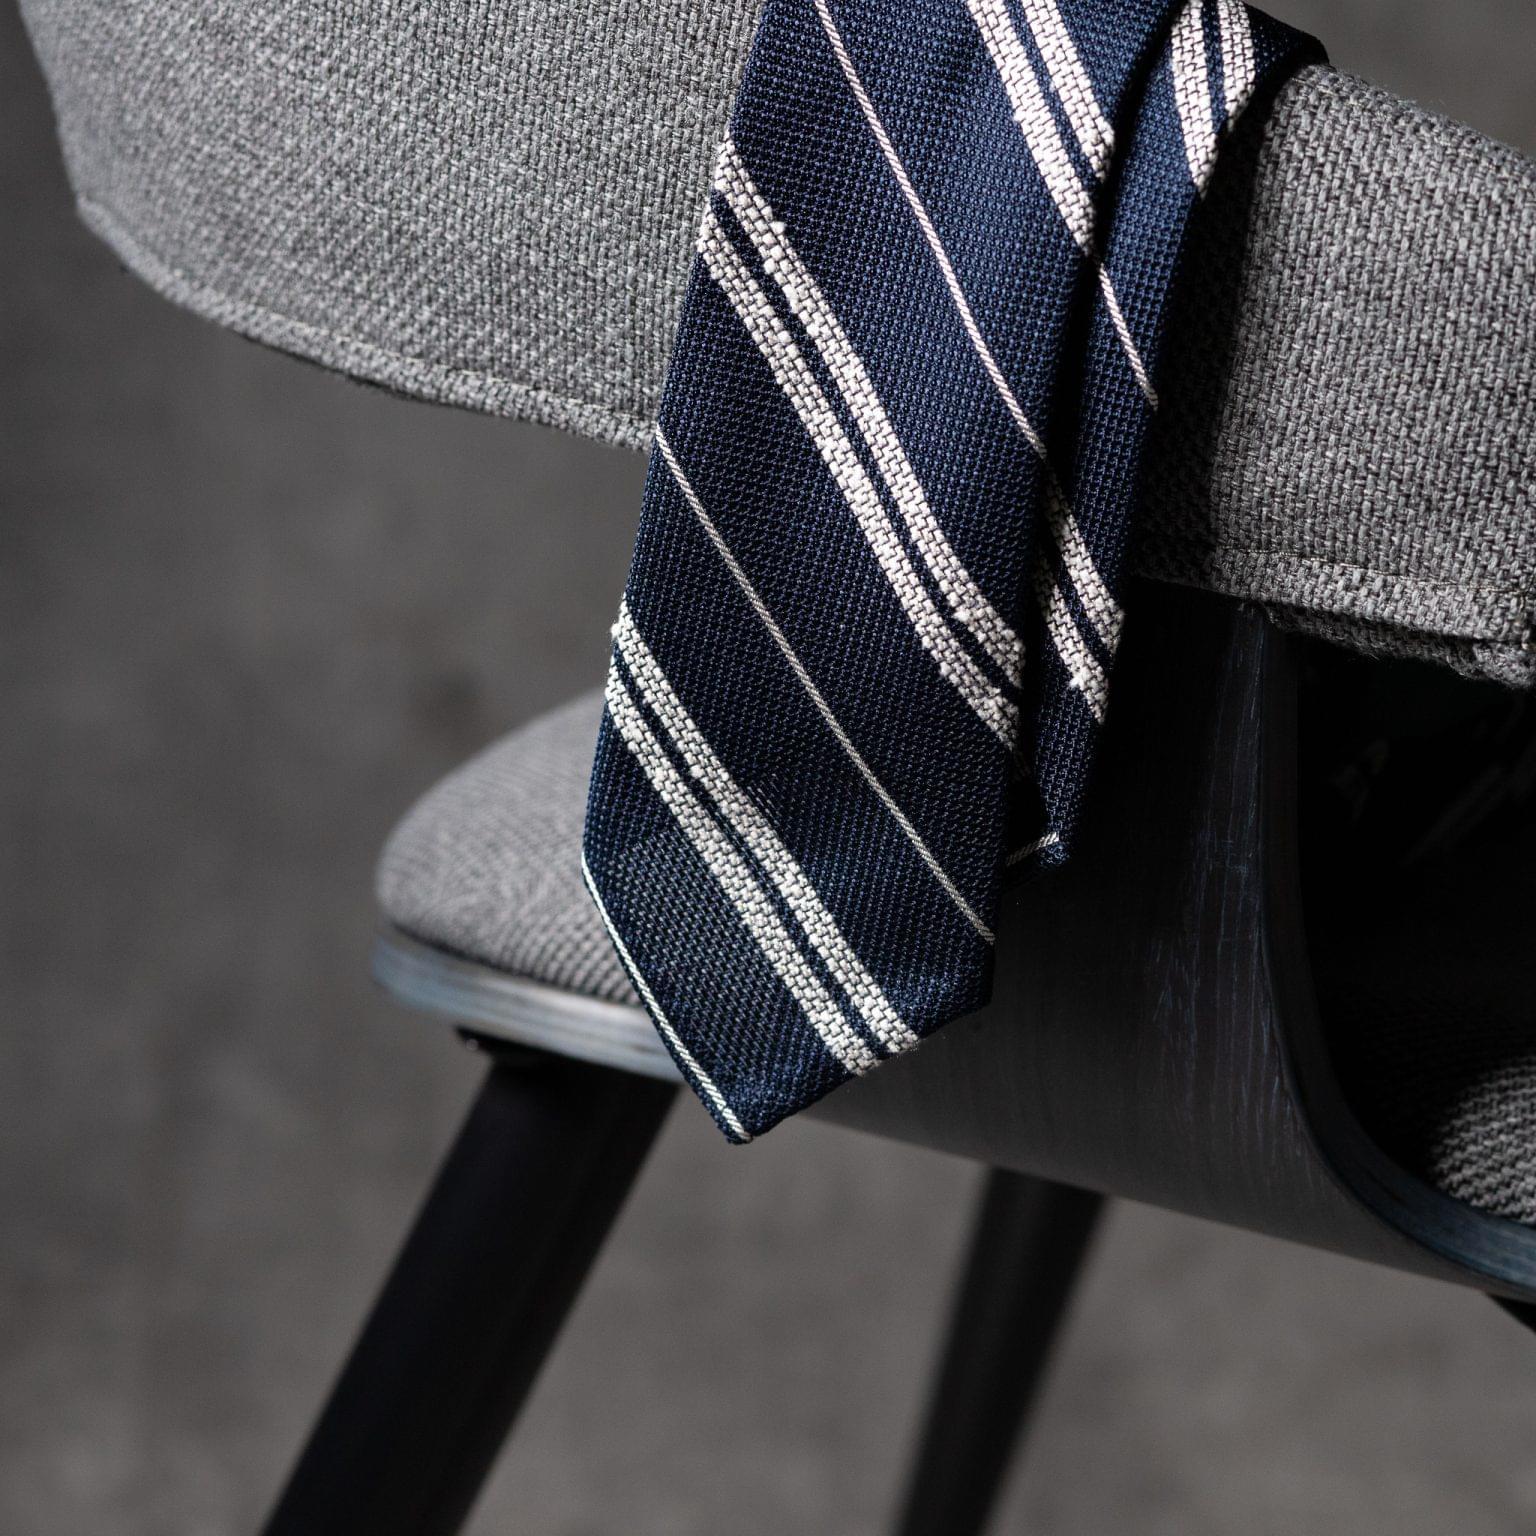 GRENADINE-0360-Tie-Initials-Corbata-Iniciales-The-Seelk-2